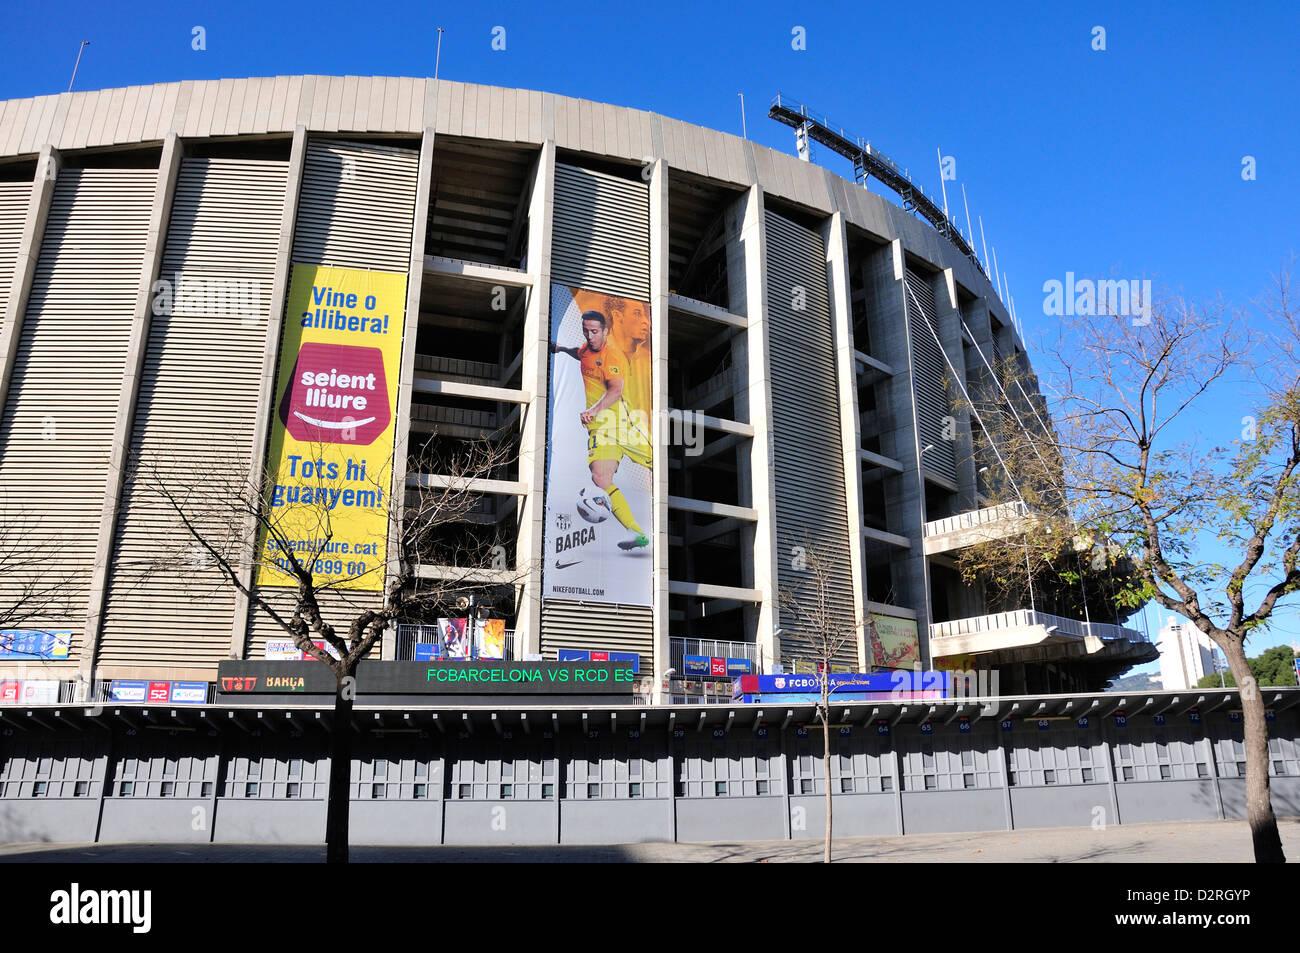 Barcelona, Catalonia, Spain. Camp Nou football stadium (1957) home of F C Barcelona - Stock Image